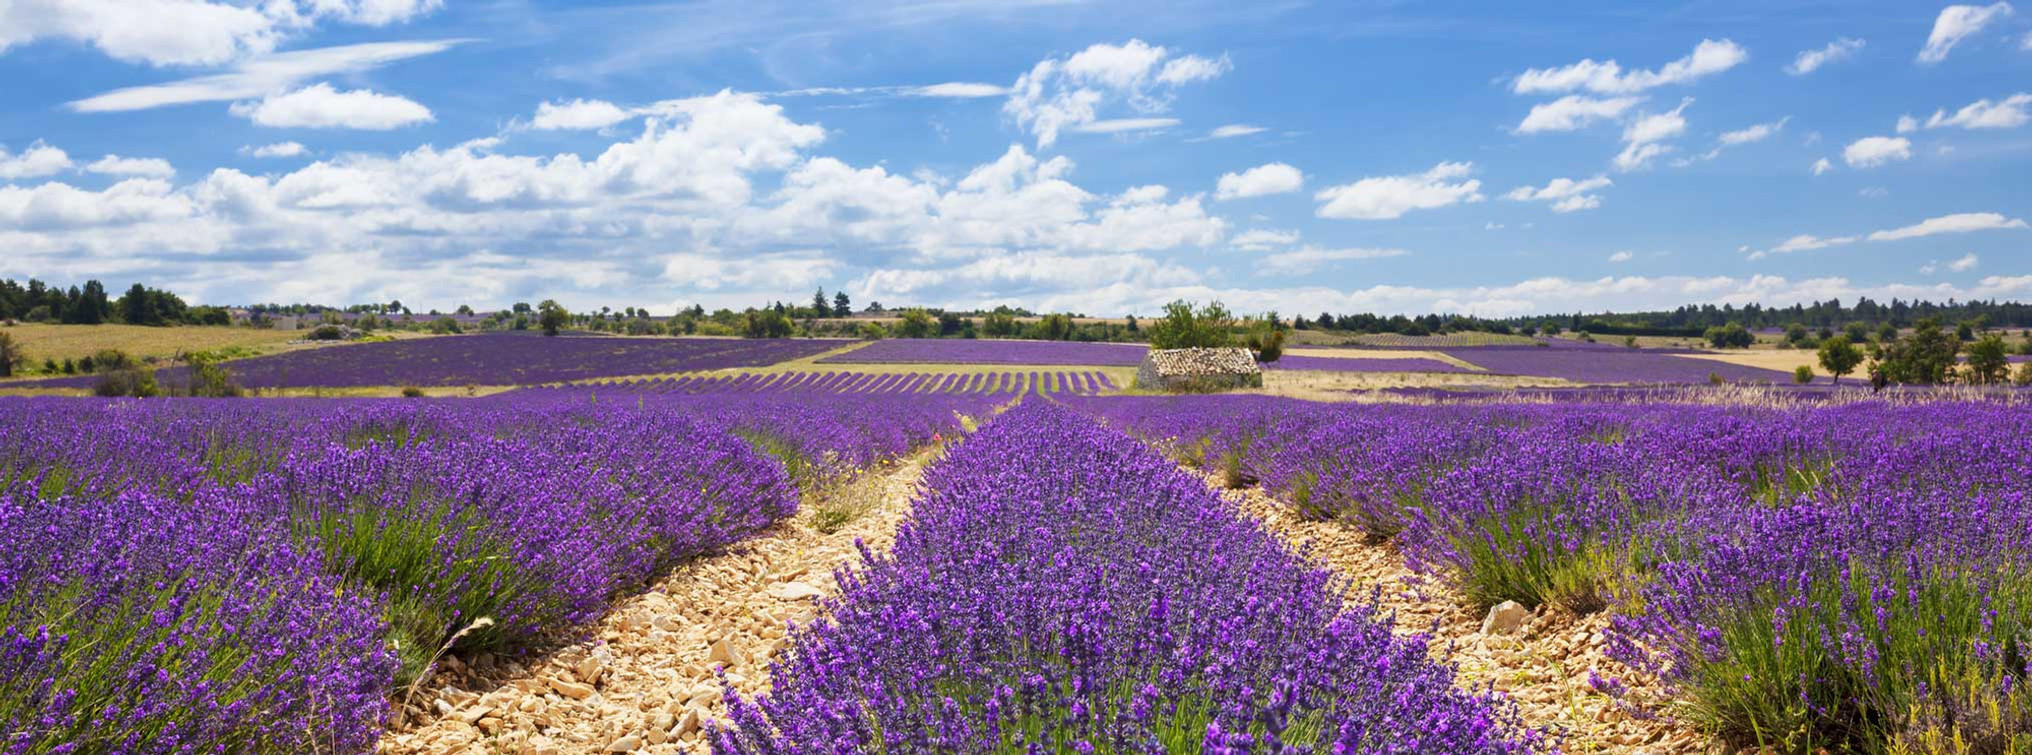 freepik-panoramic-view-lavender-field-cl